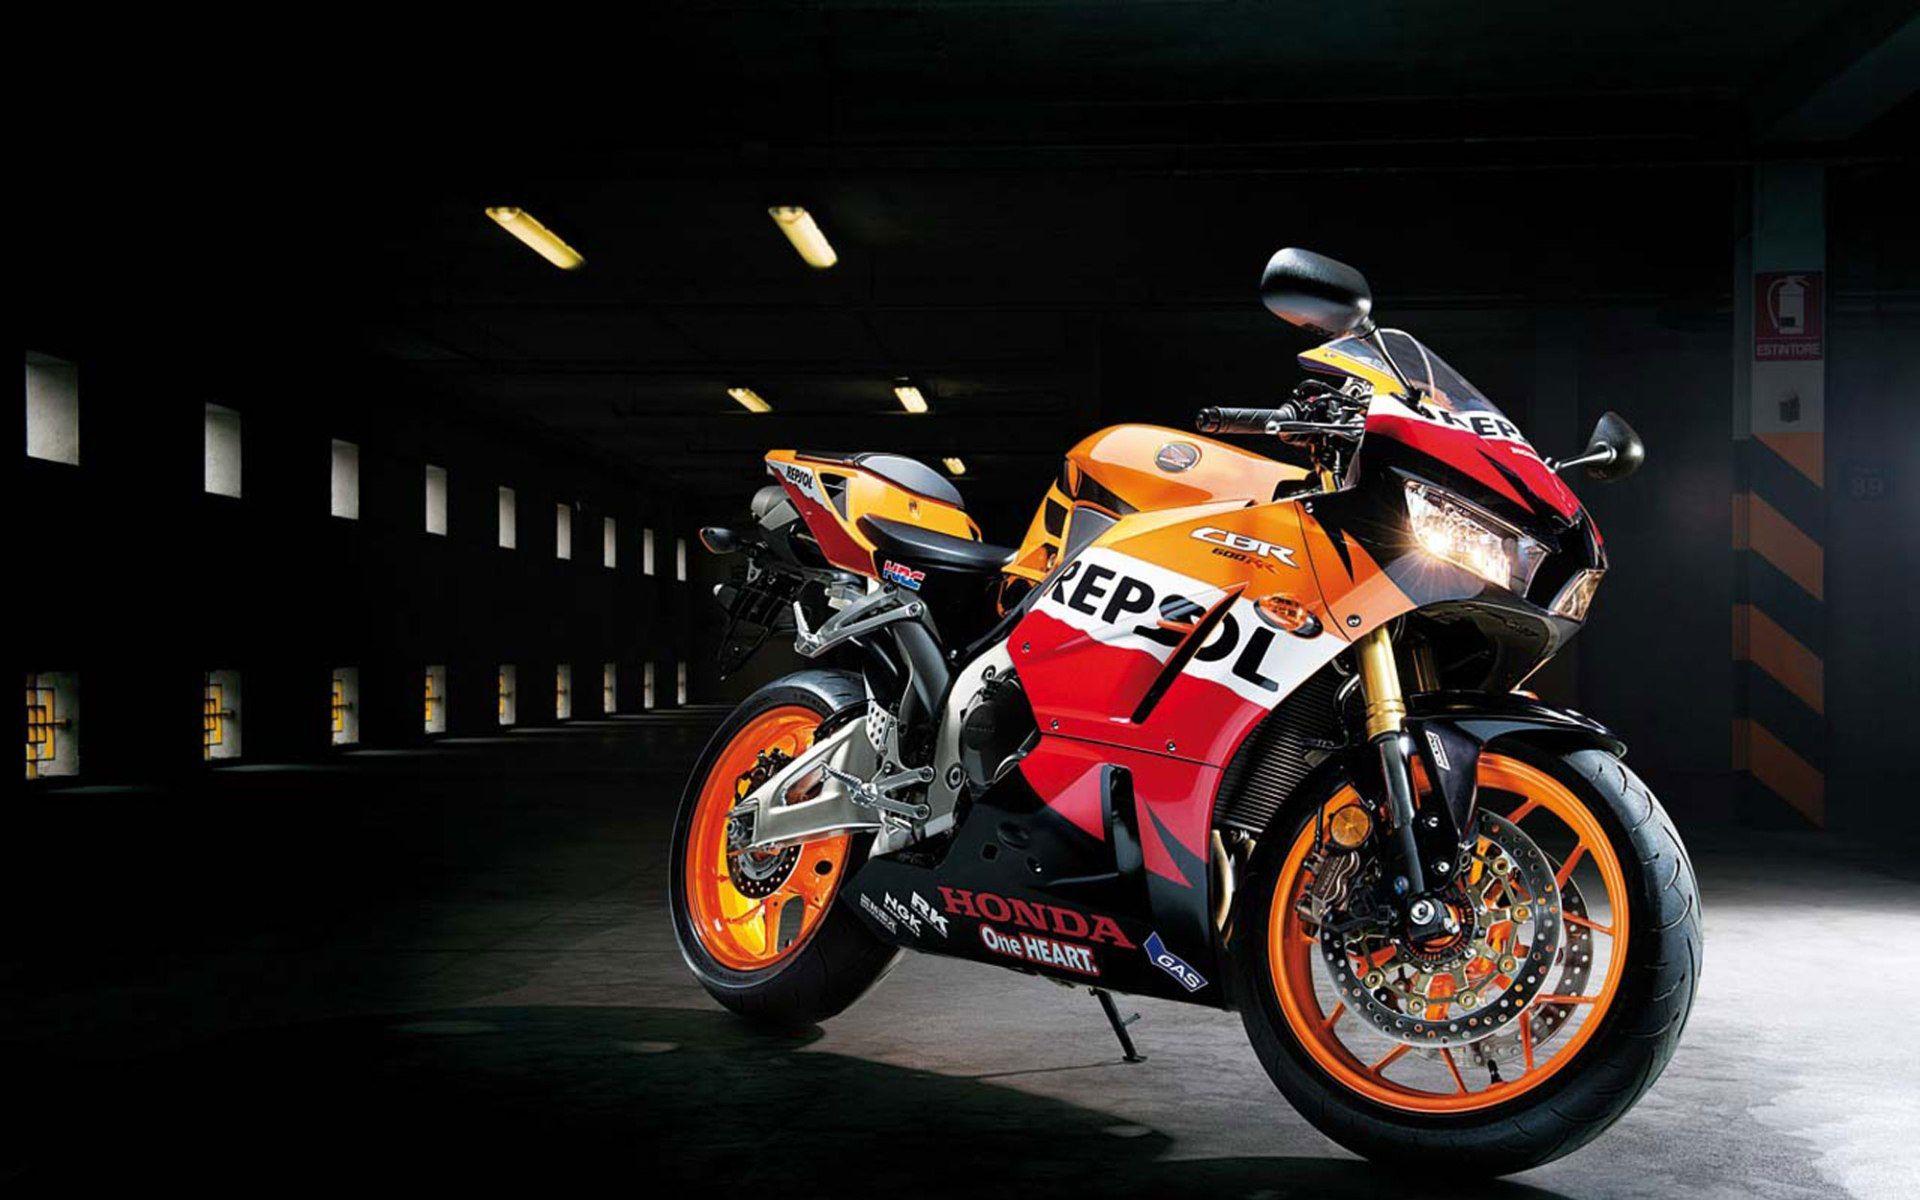 2013 Honda CBR 600 RR Repsol Wallpaper motomania Honda 1920x1200